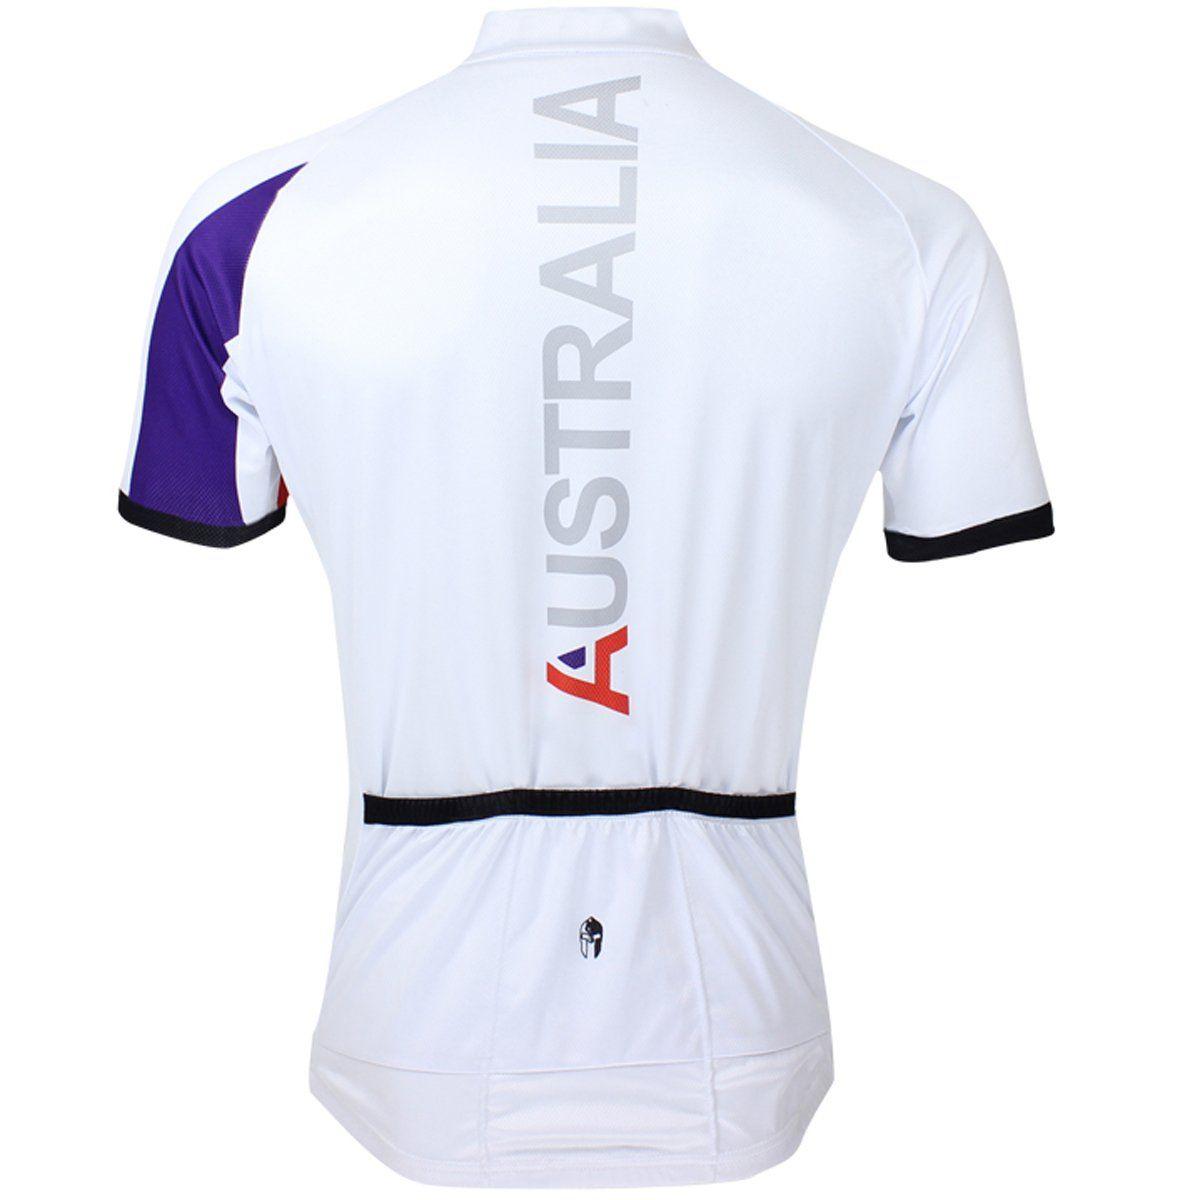 Mens Cycling Clothing Australia